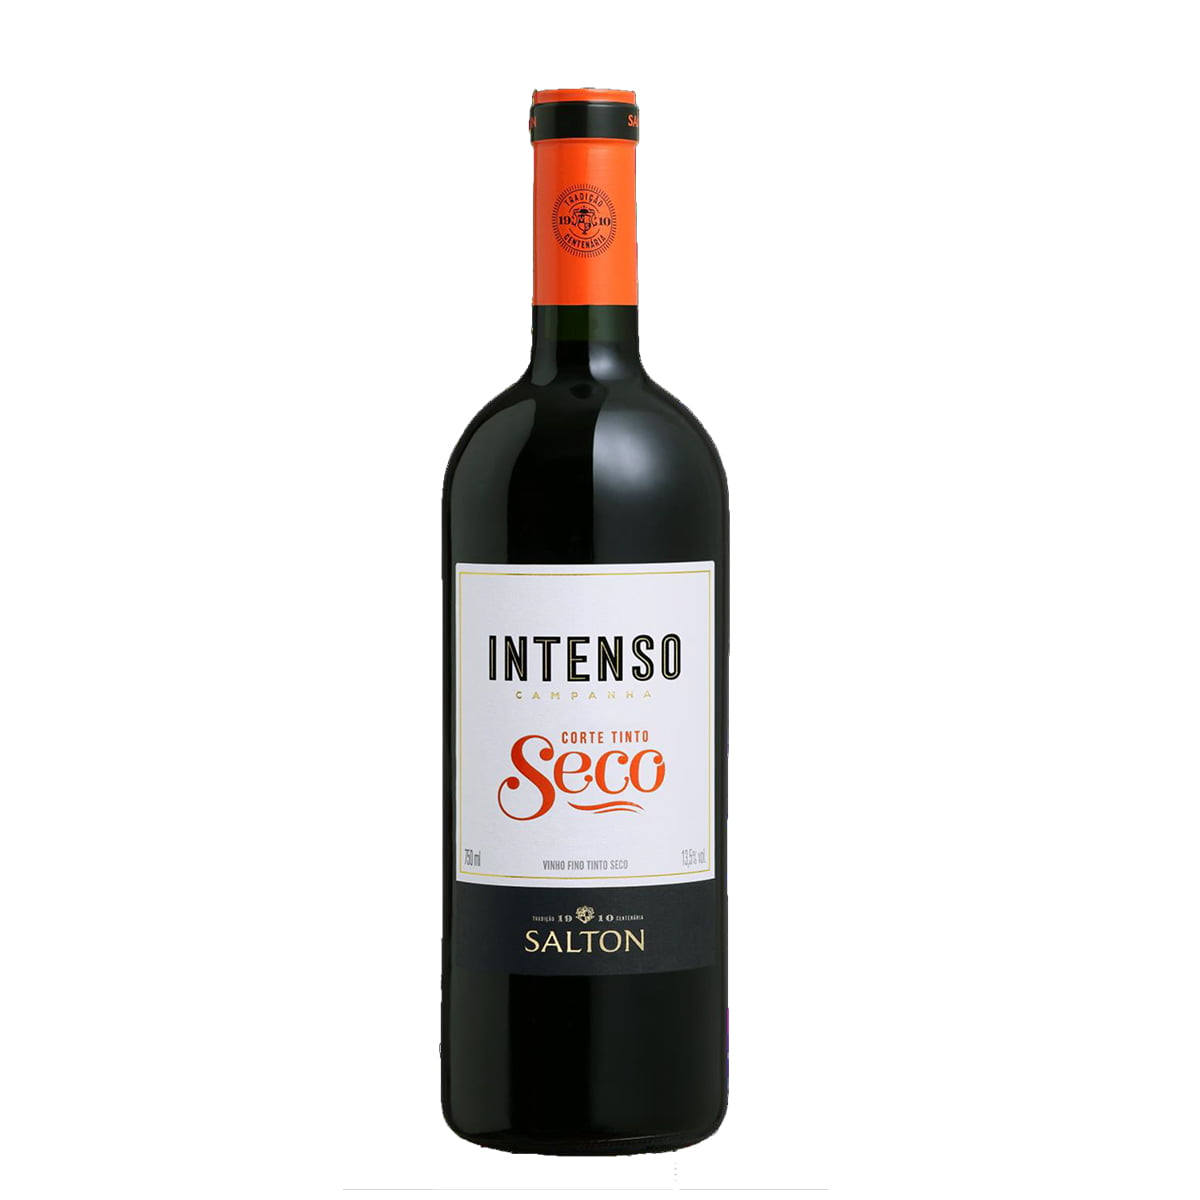 Vinho Salton Intenso Corte Tinto Seco 750ml